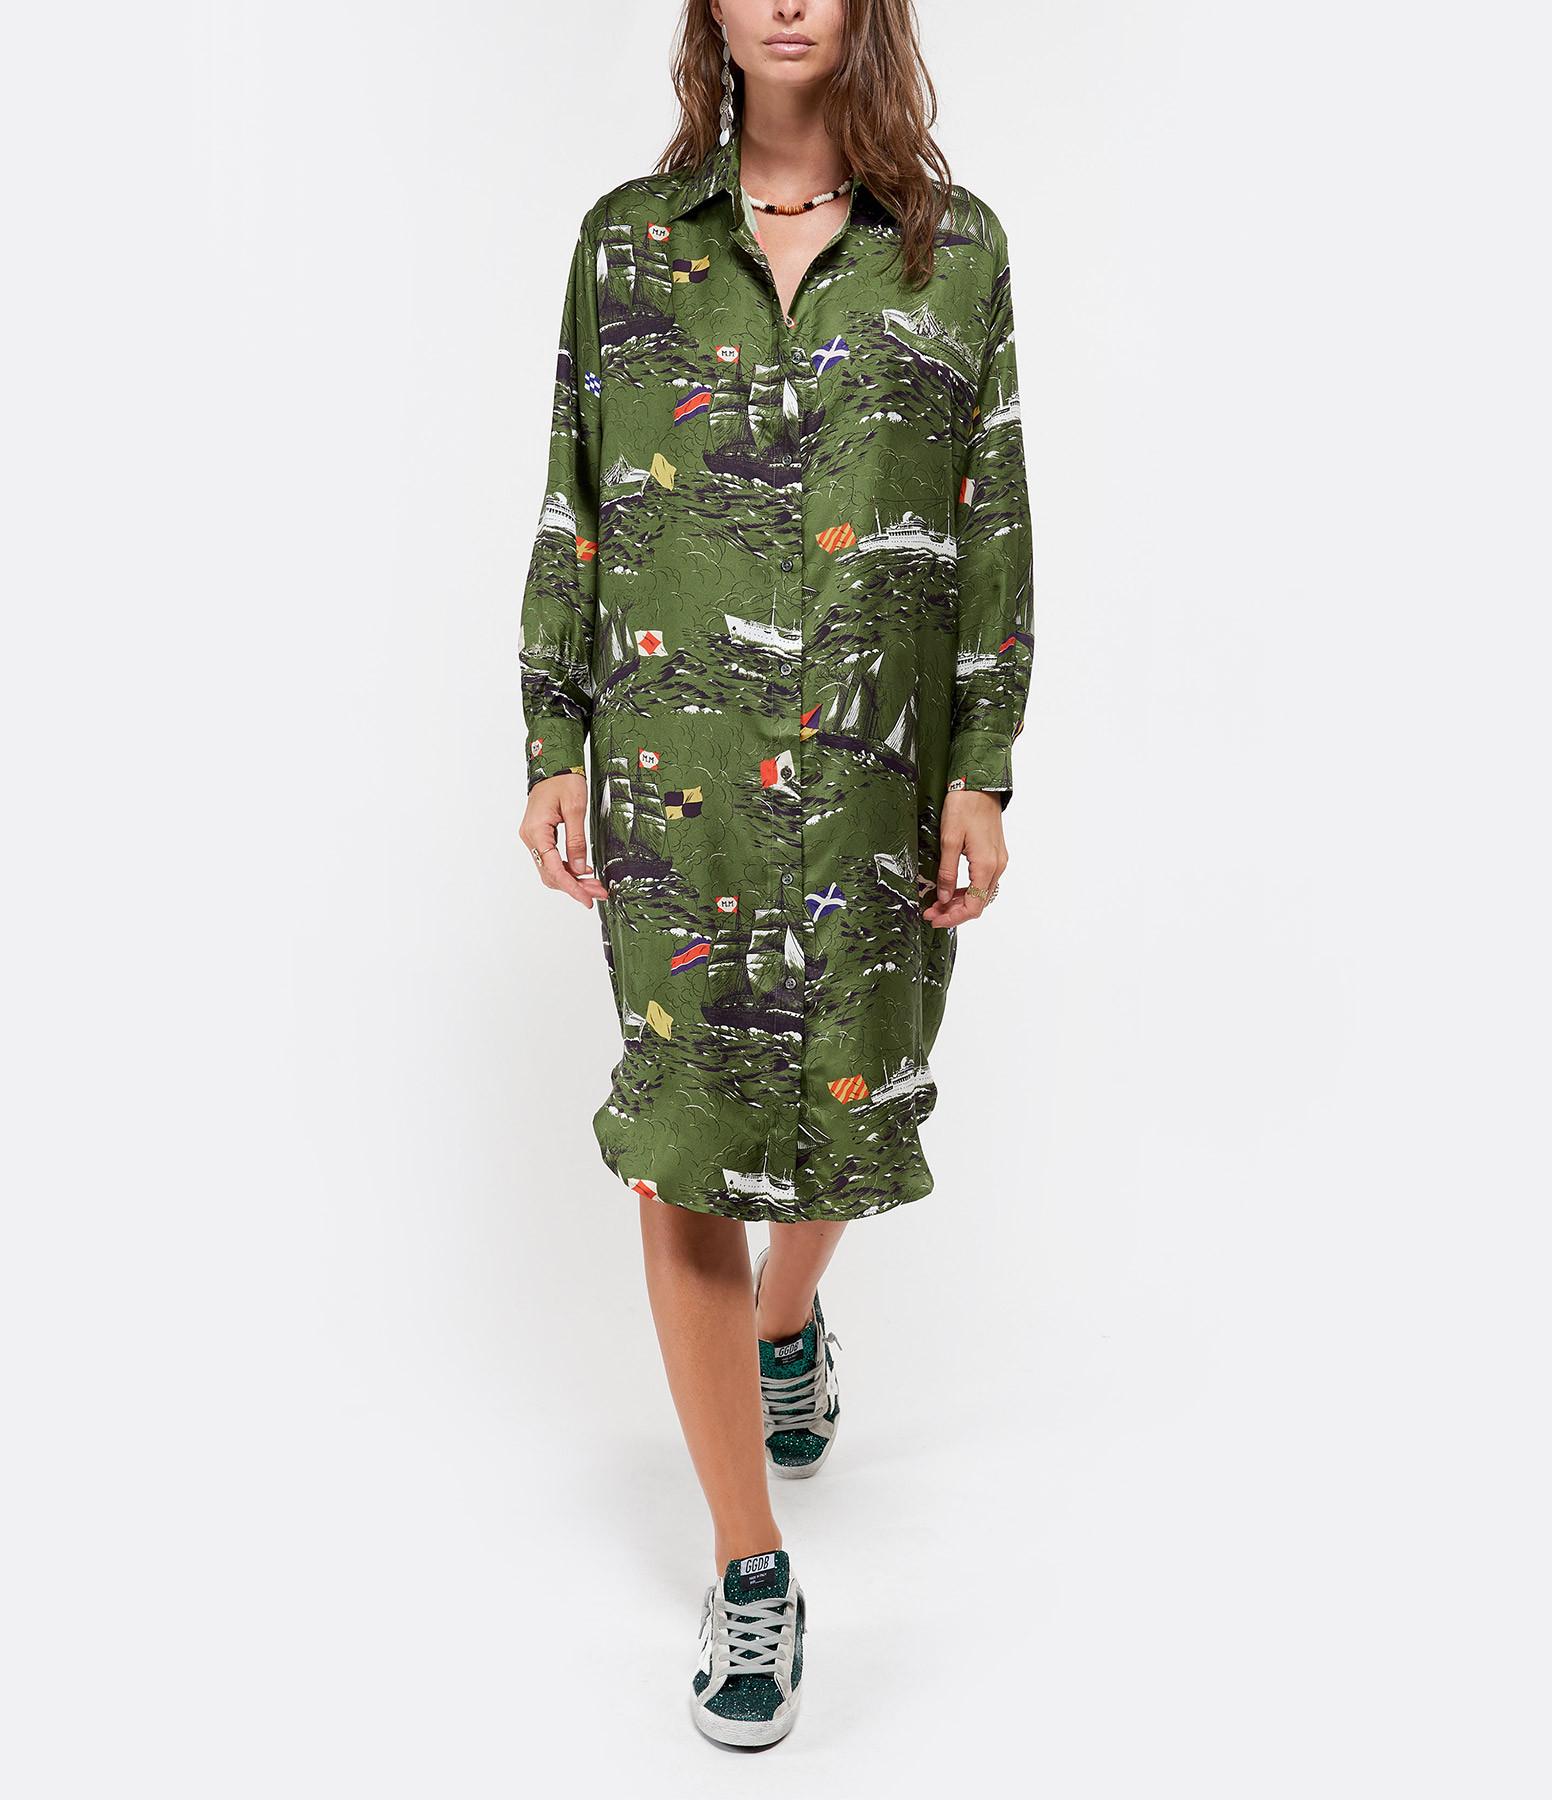 LA PRESTIC OUISTON - Robe Carnac Soie Vert Navire